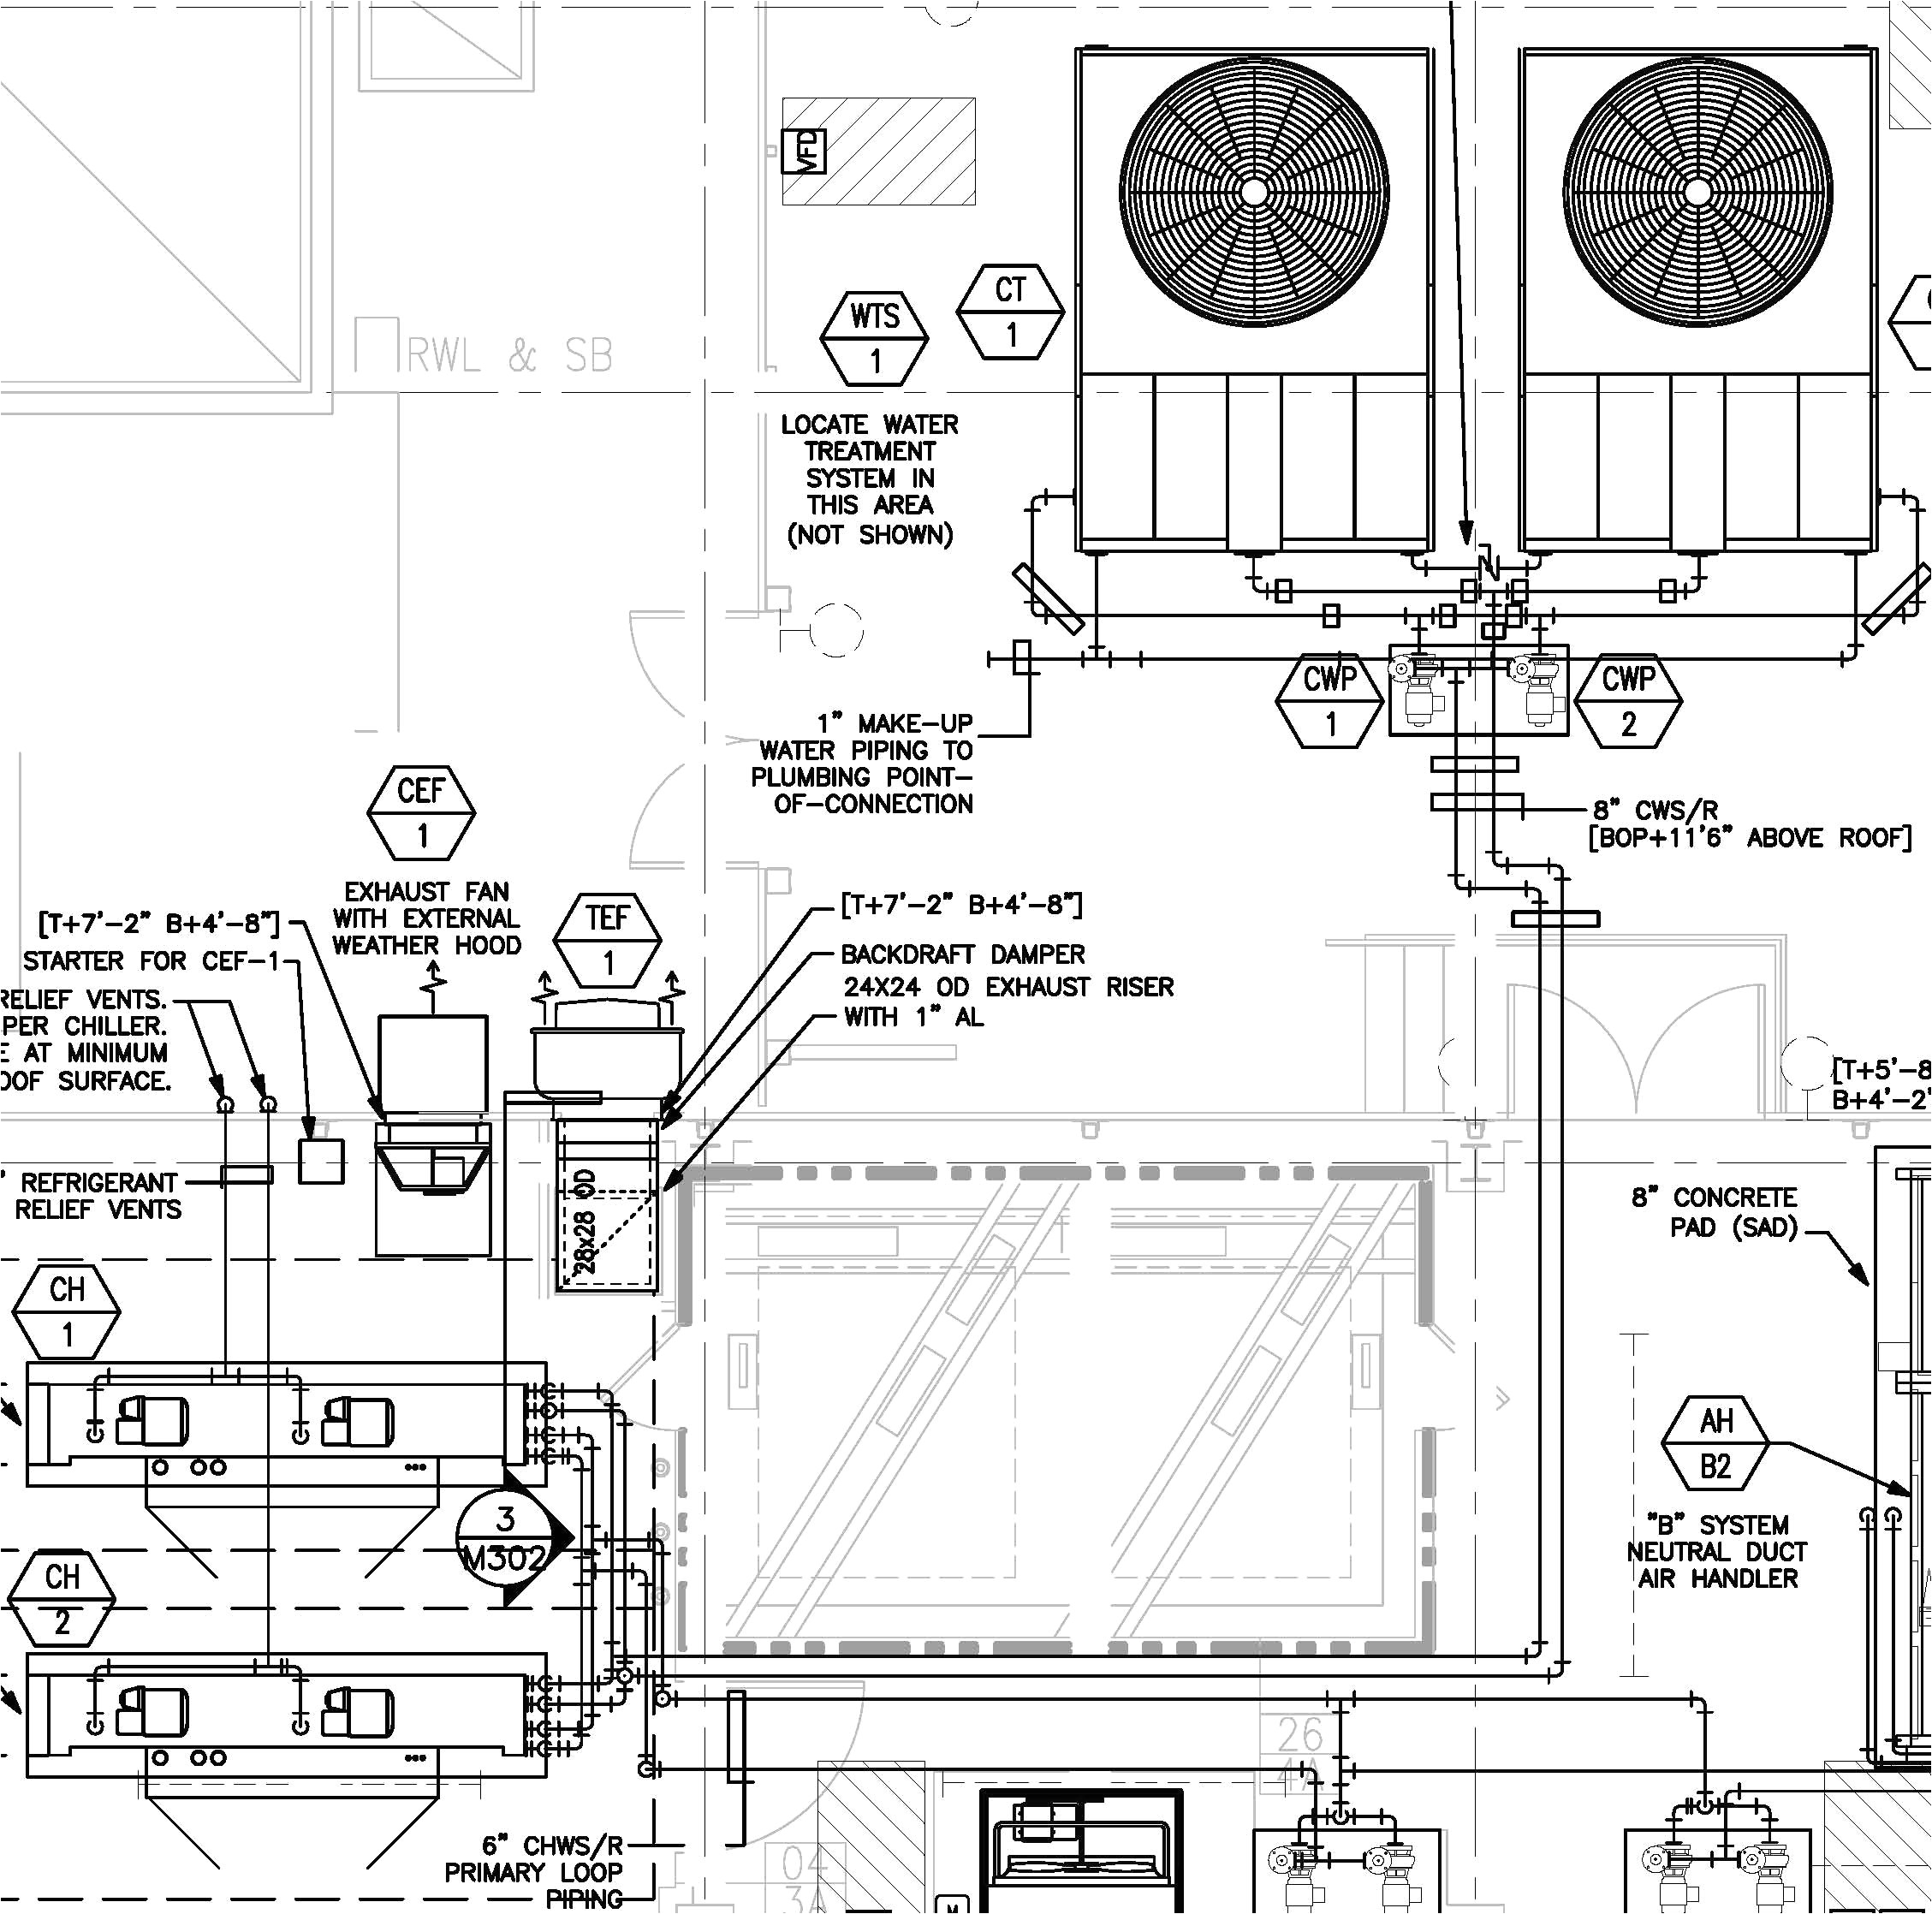 meyer plow wiring diagram data in meyers meyers plow